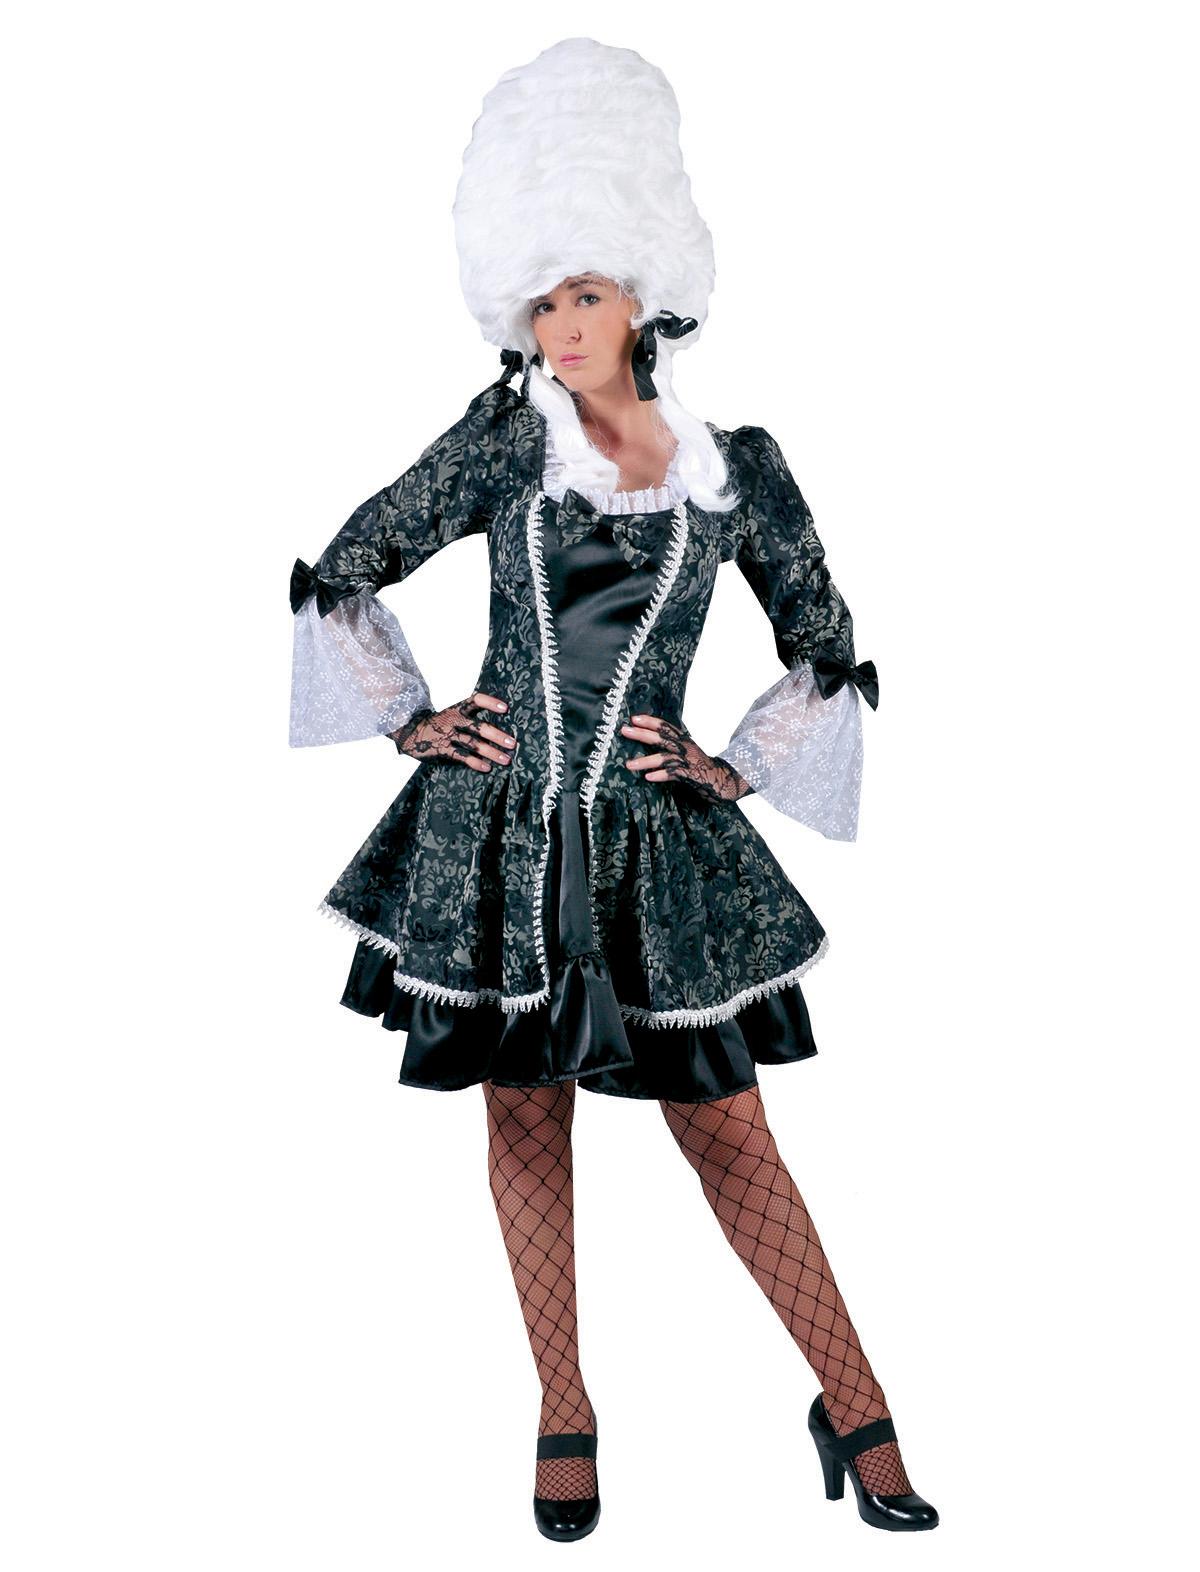 Madame Antoinette